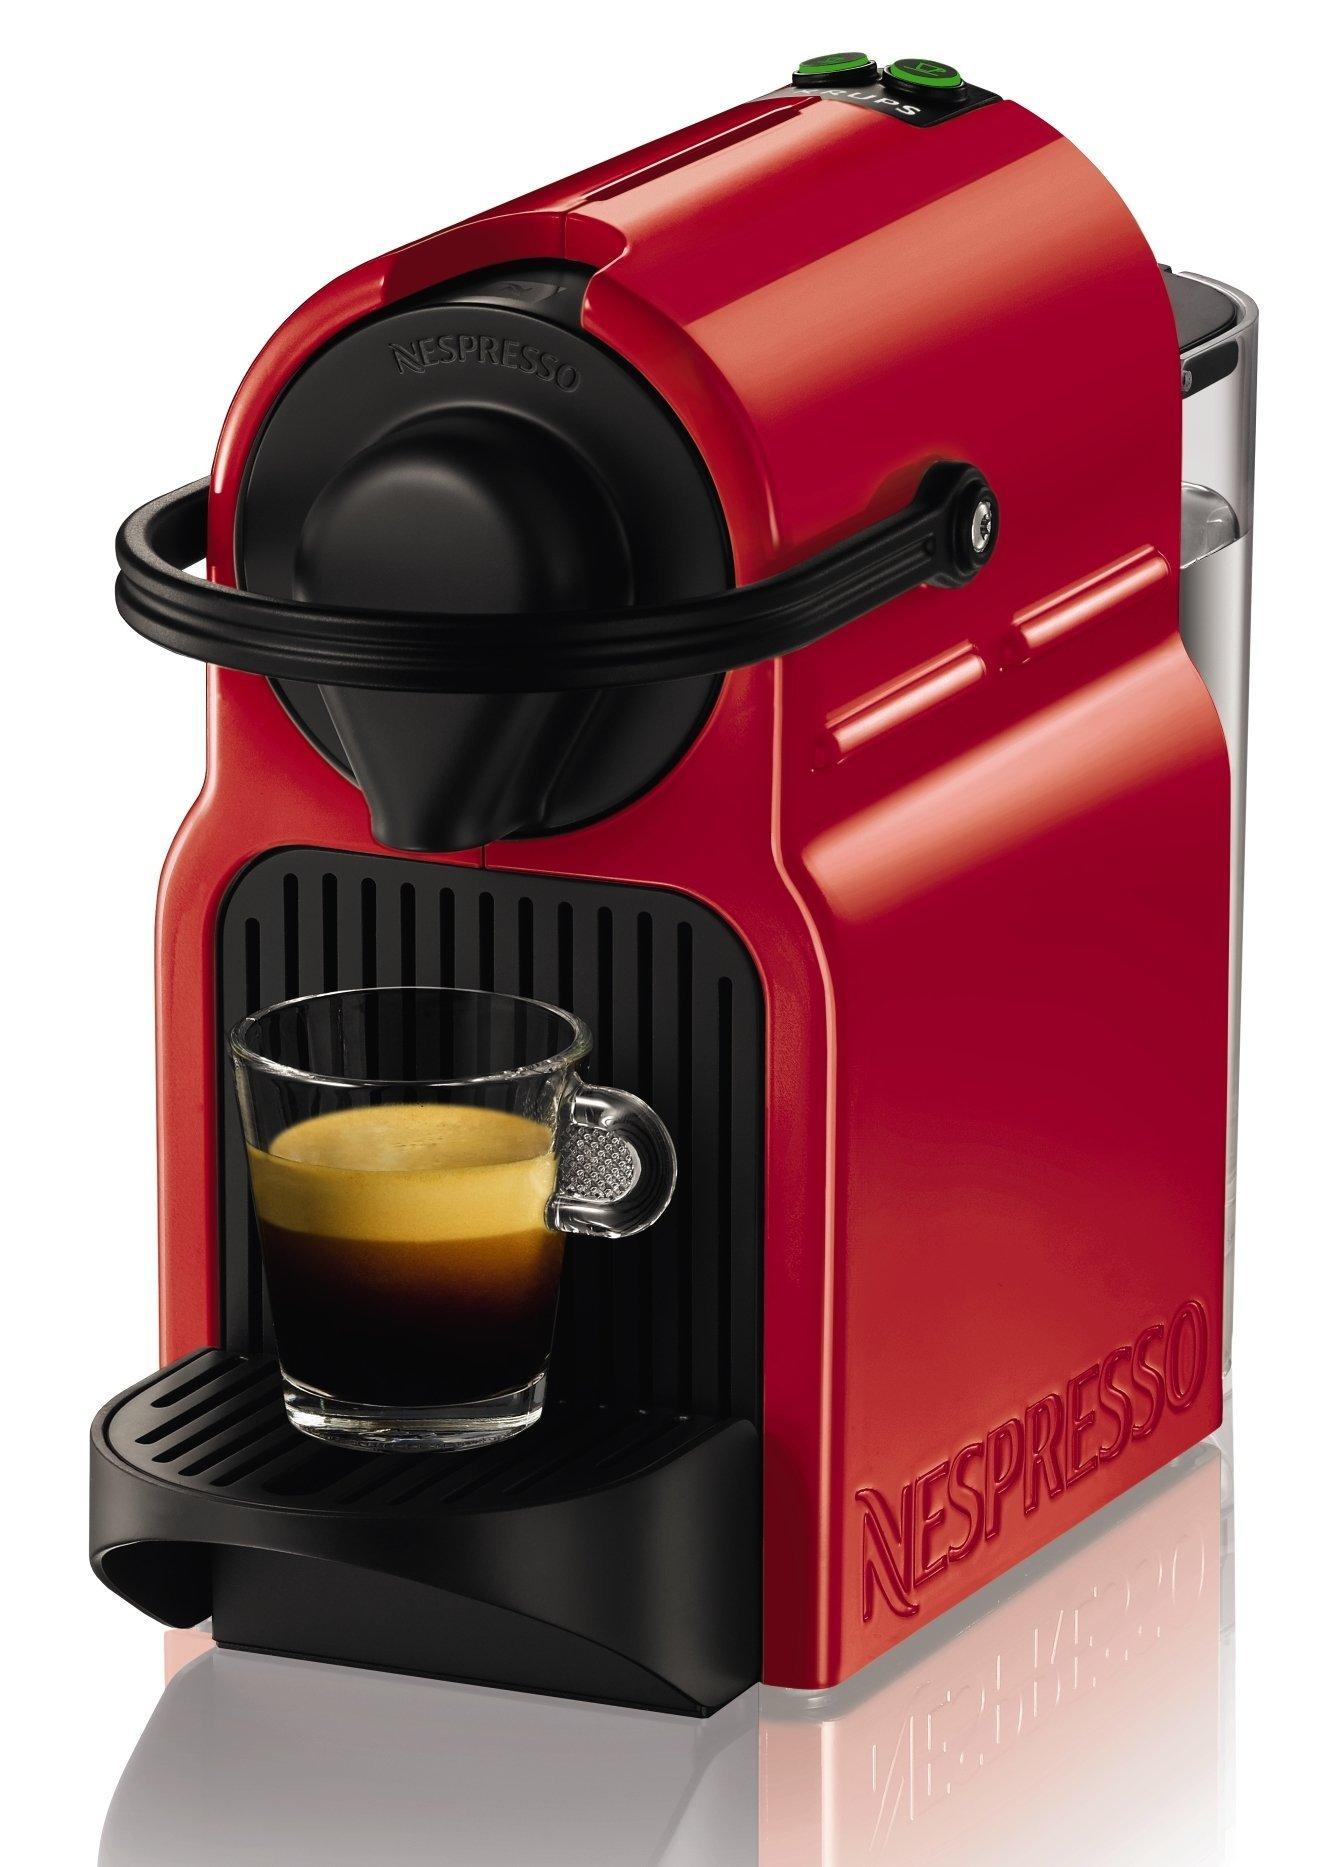 Krups Nespresso Inissia Rouge YY1531FD Independiente Máquina de café en cápsulas 0.7L Negro, Rojo - Cafetera (Independiente, Máquina de café en cápsulas, 0,7 L, Cápsula de café, 1200 W, Negro, Rojo): Amazon.es: Hogar